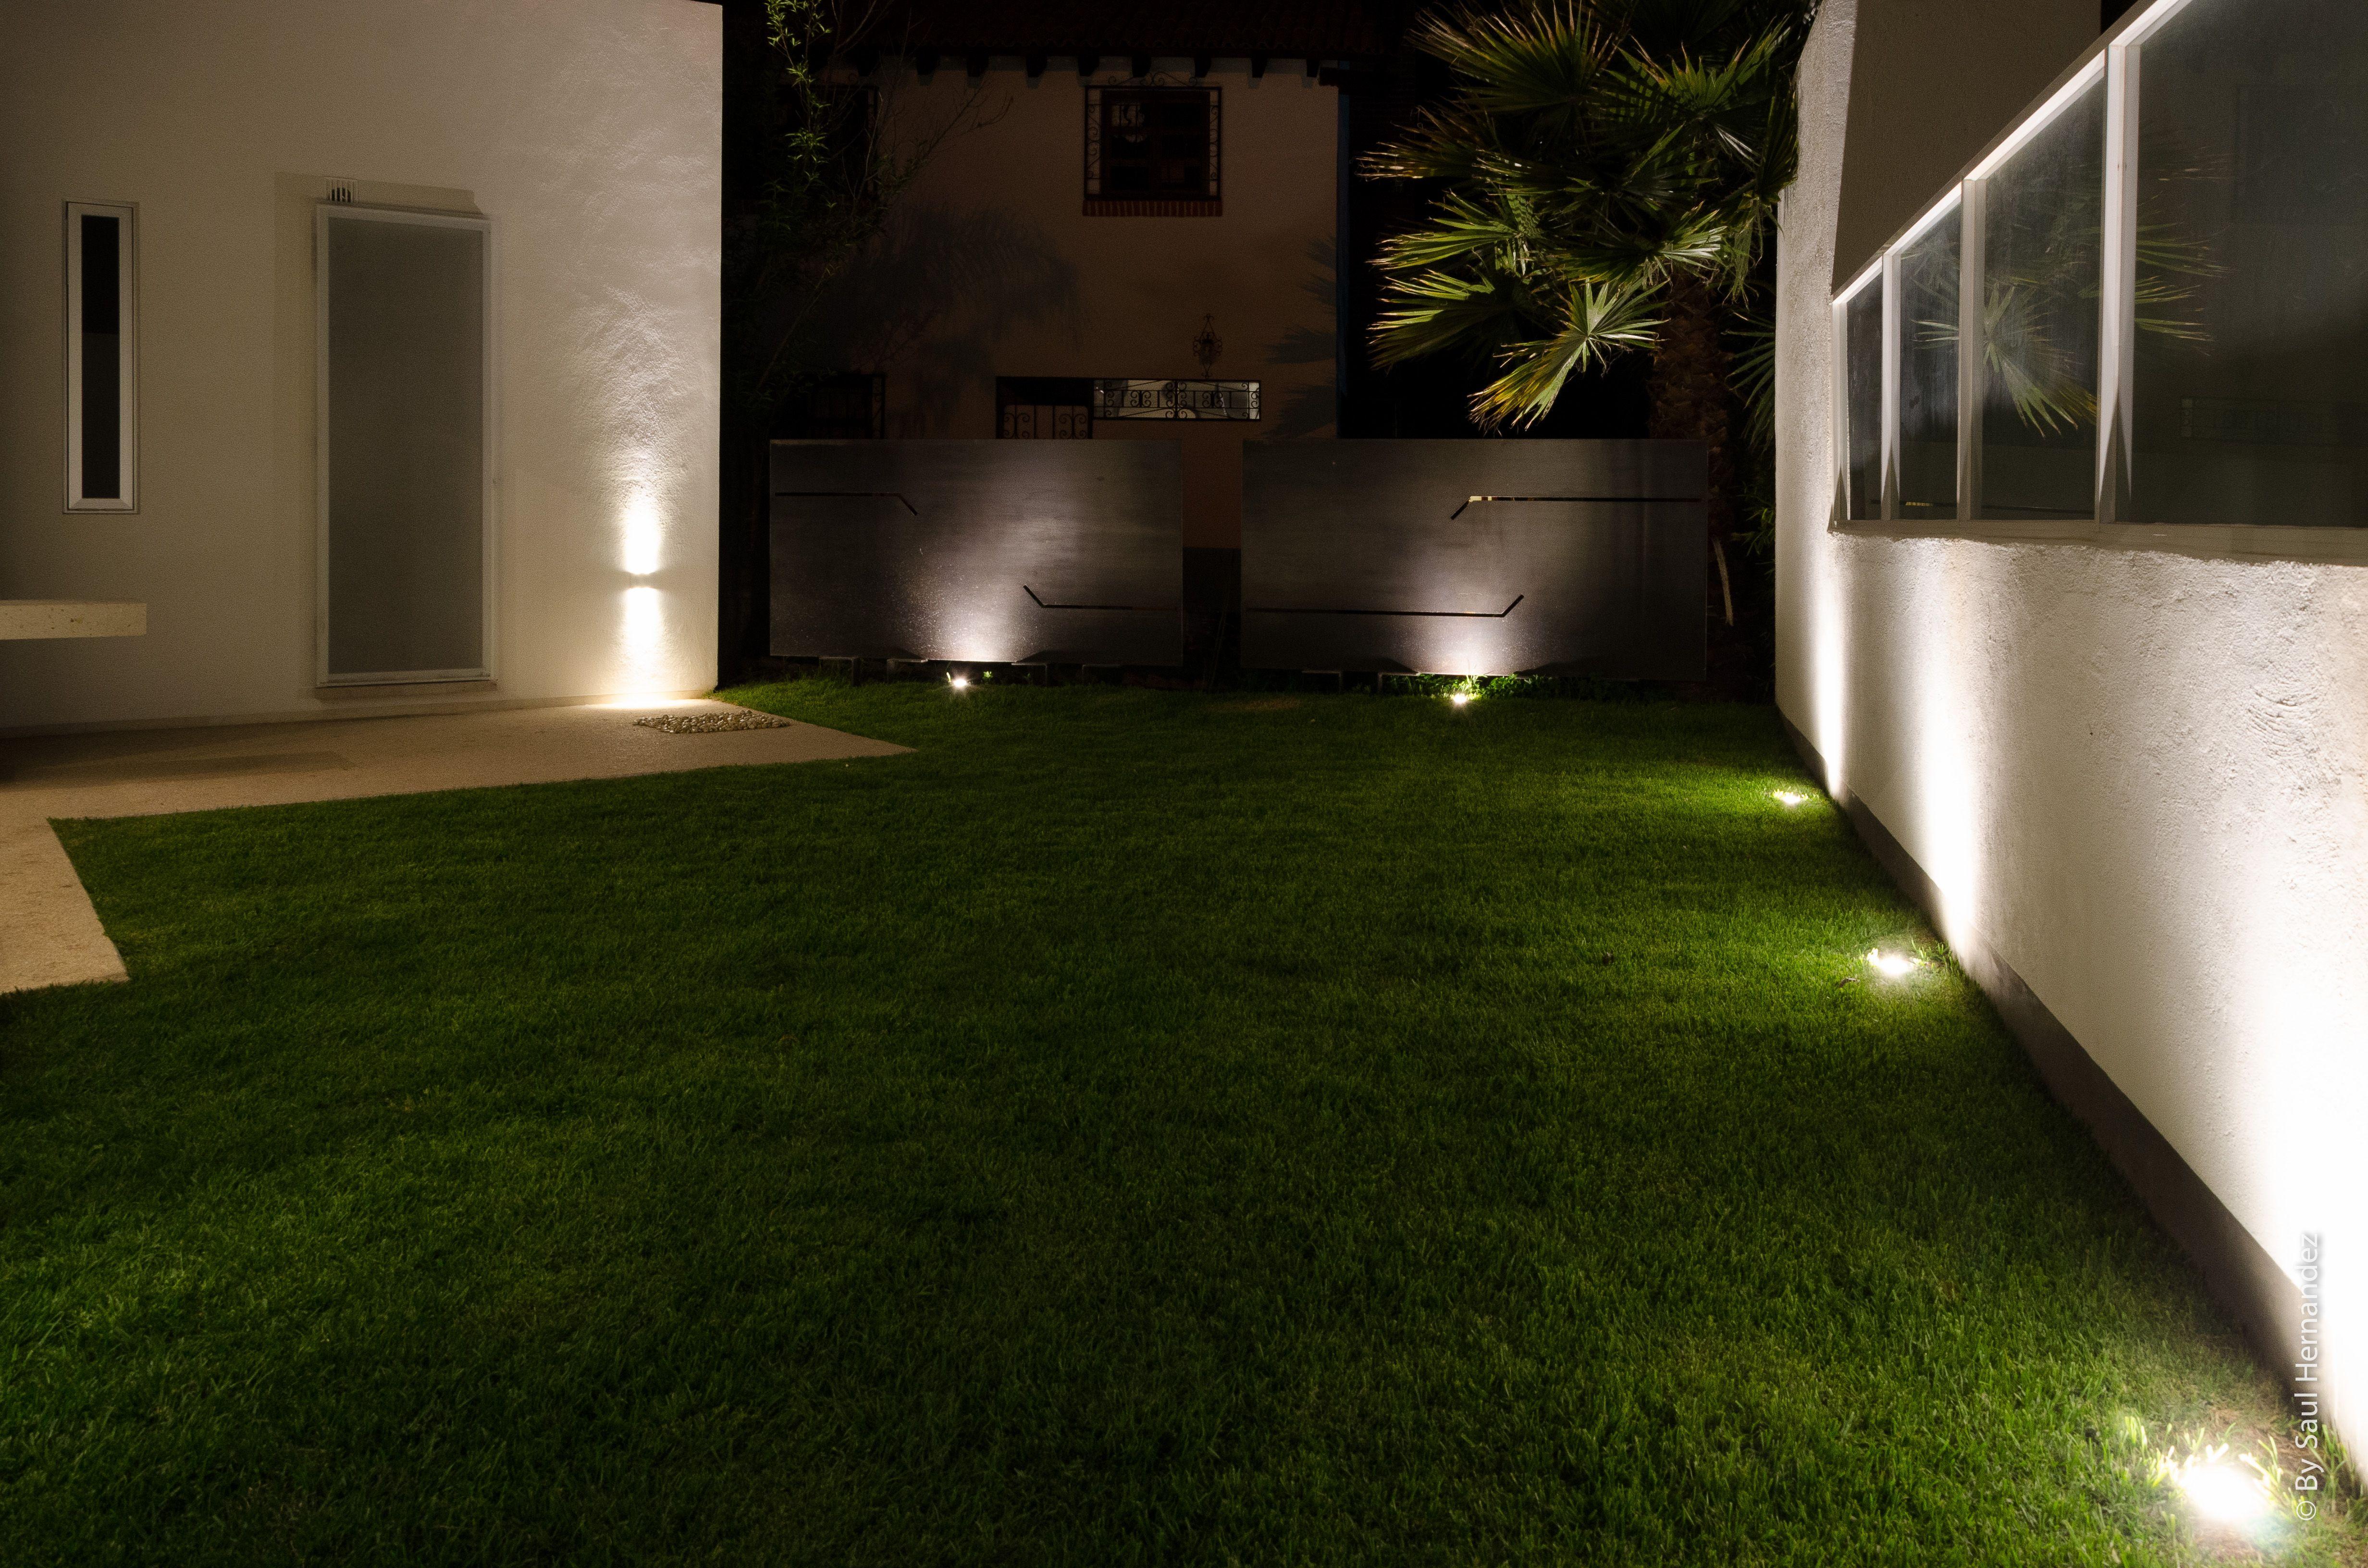 Iluminacion Led Exterior Jardin  Decoracion Del Hogar